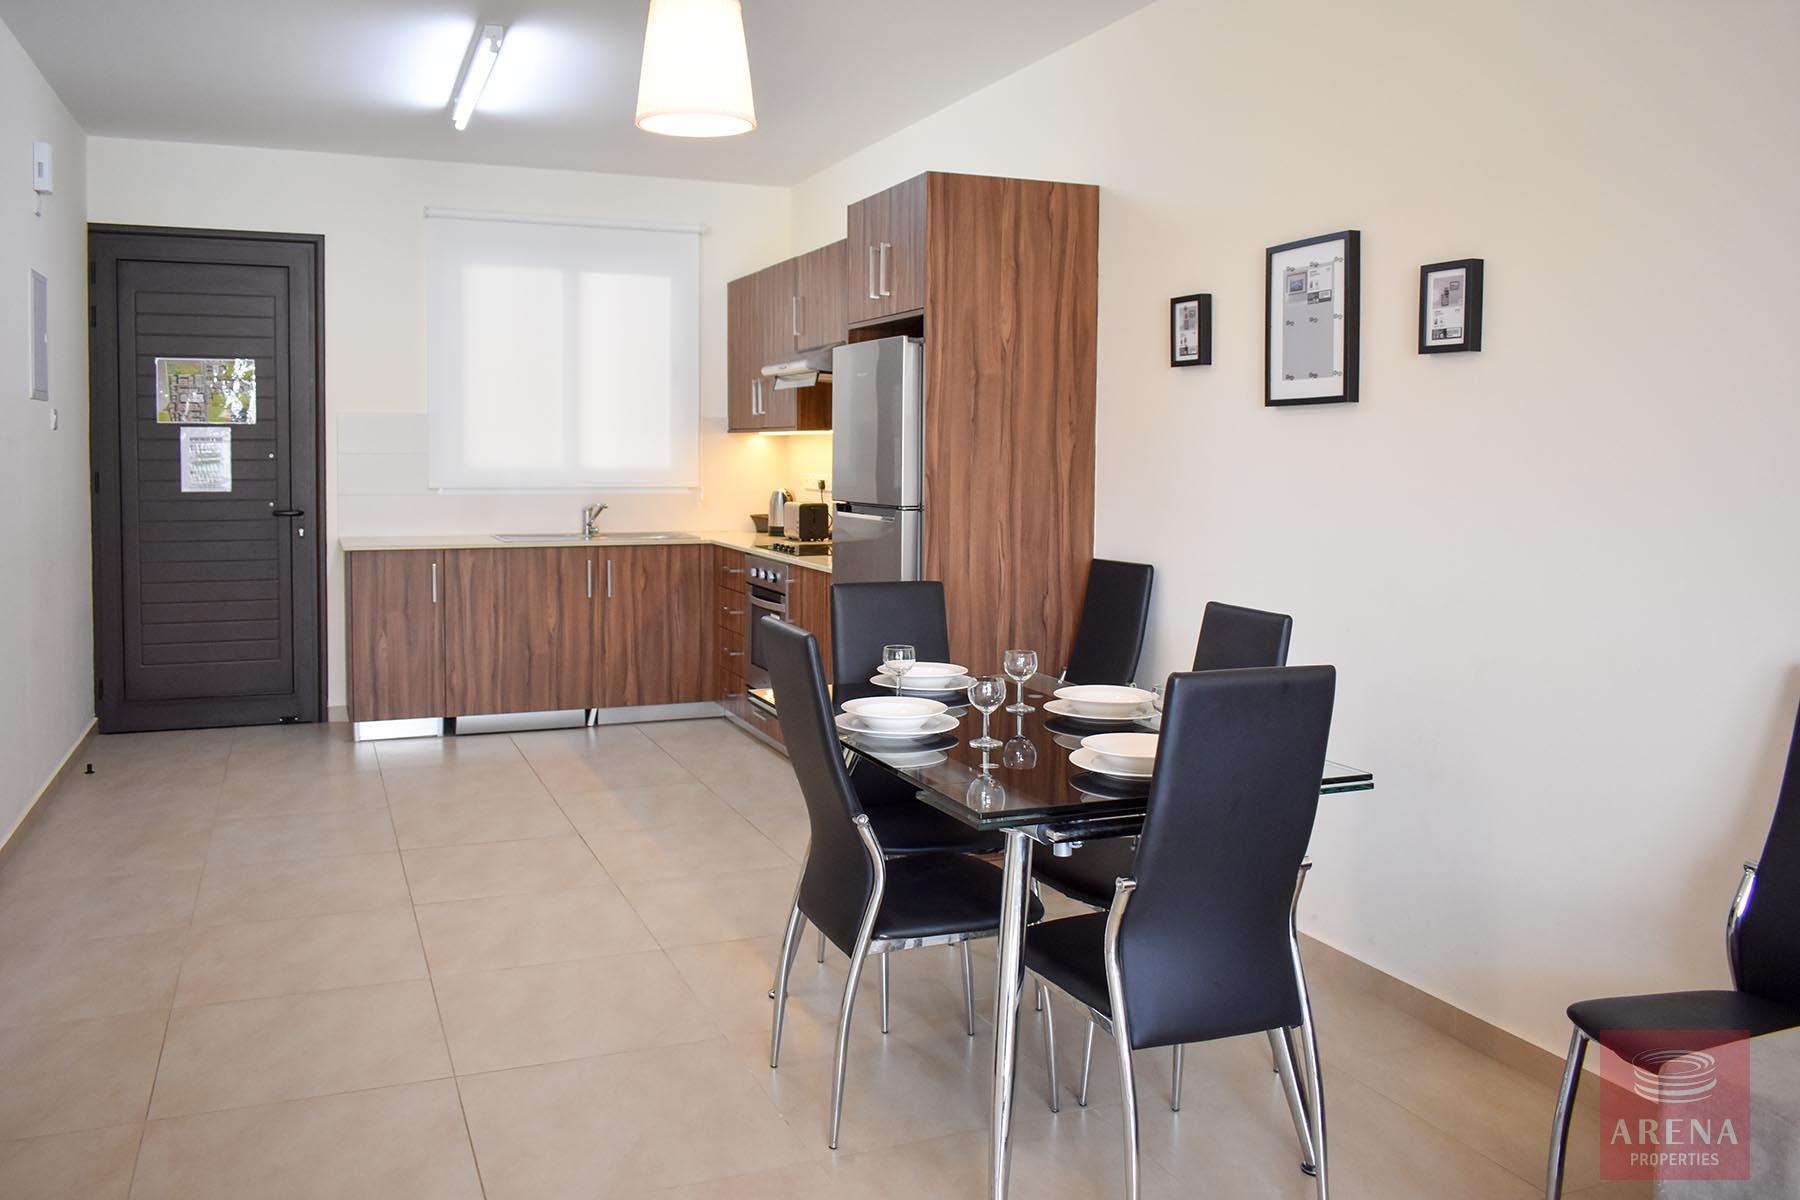 Ground Floor Apartment in Kapparis to buy - kitchen